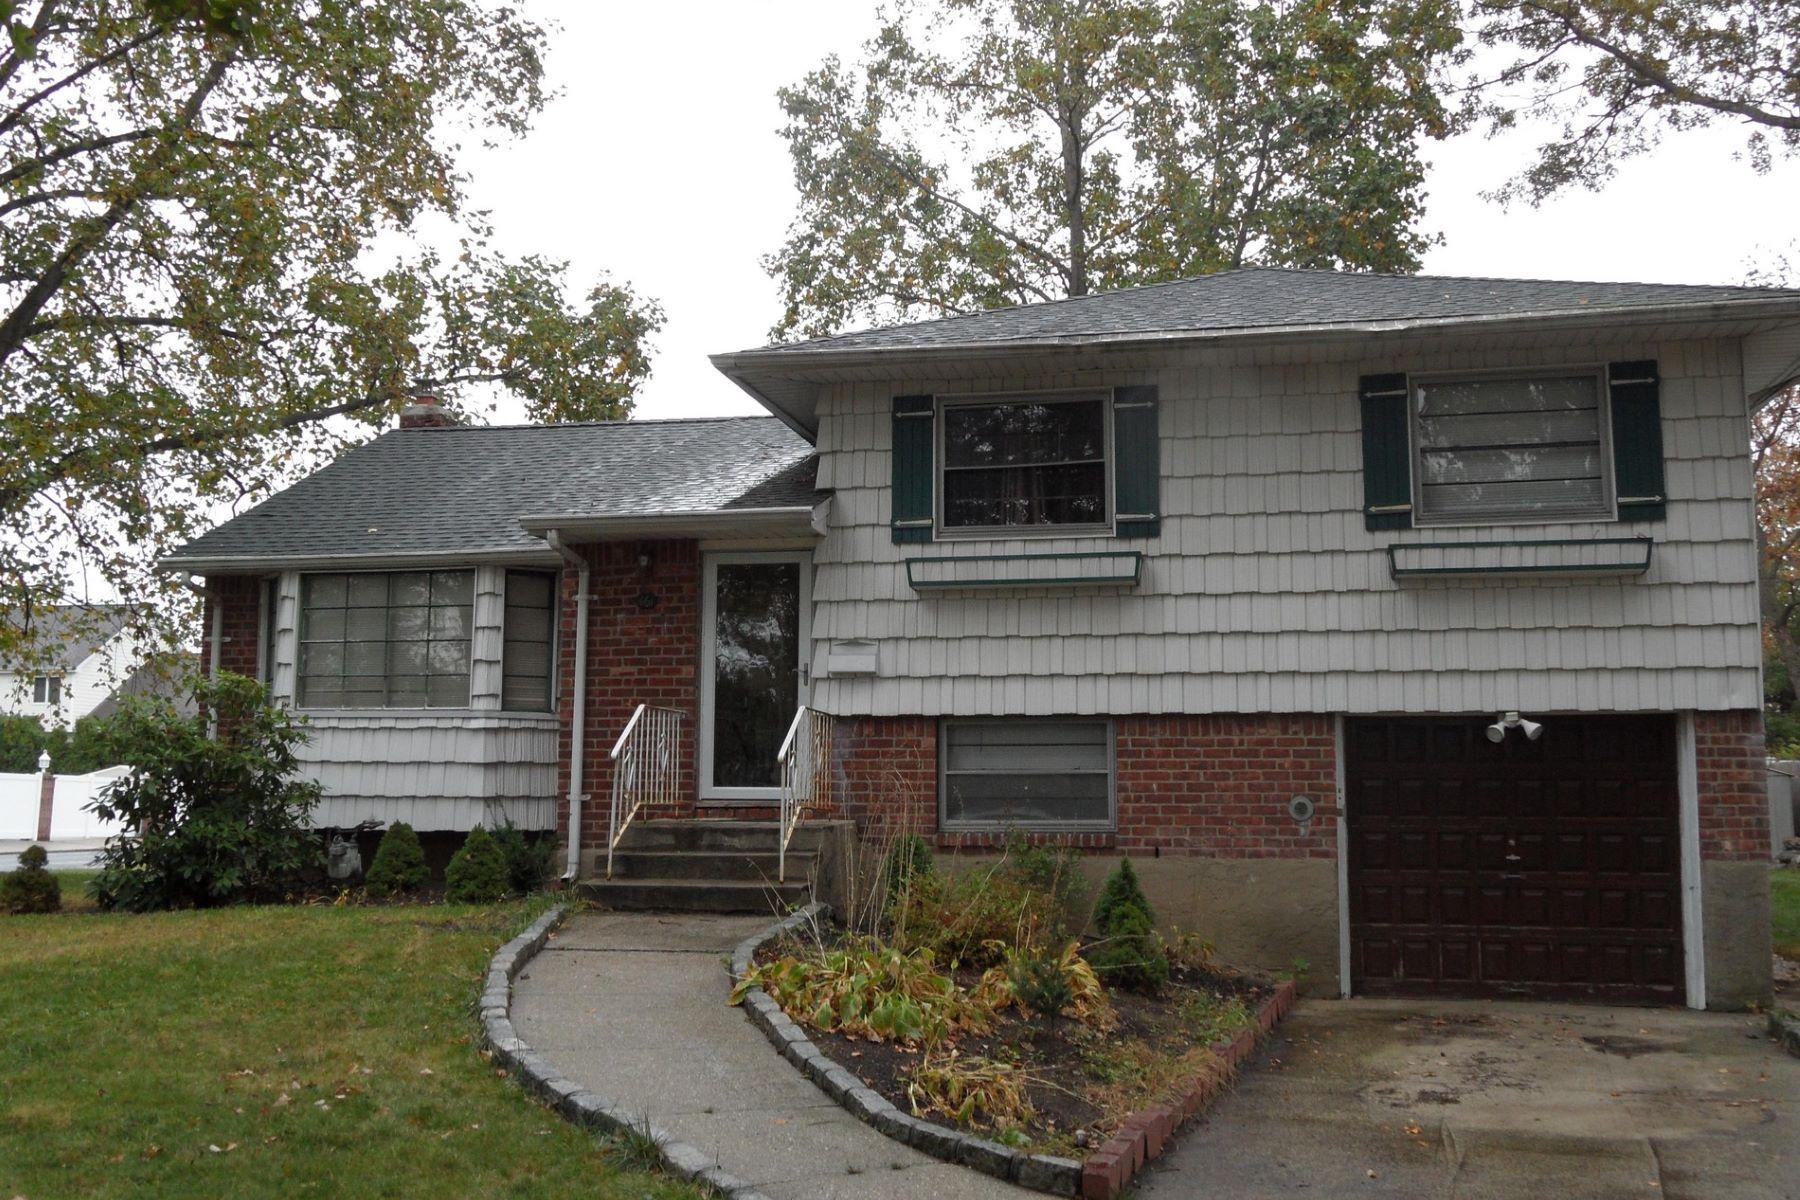 Single Family Homes for Sale at N. Babylon 461 Goodrich Ave North Babylon, New York 11703 United States